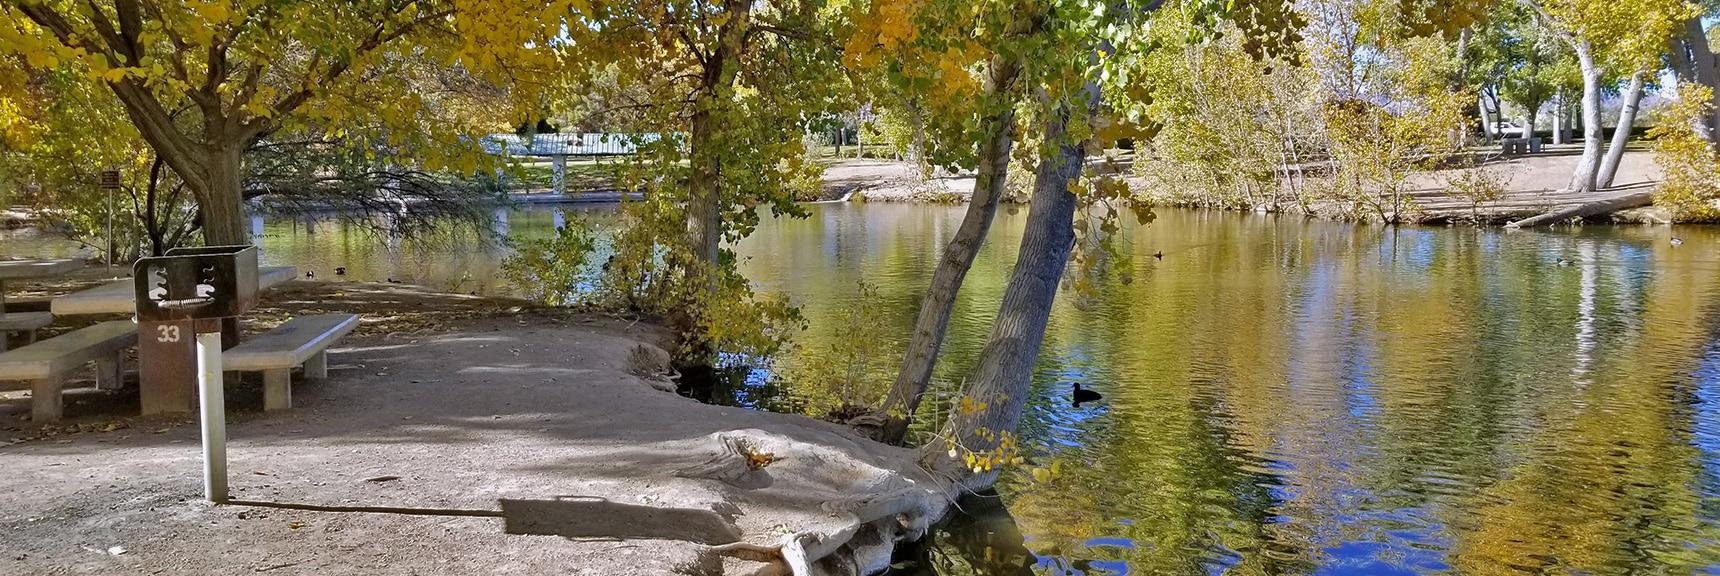 Picnicking on Tule Lake at Floyd Lamb Park   Centennial Hills Mountain Bike Conditioning Adventure Loop, Las Vegas, Nevada